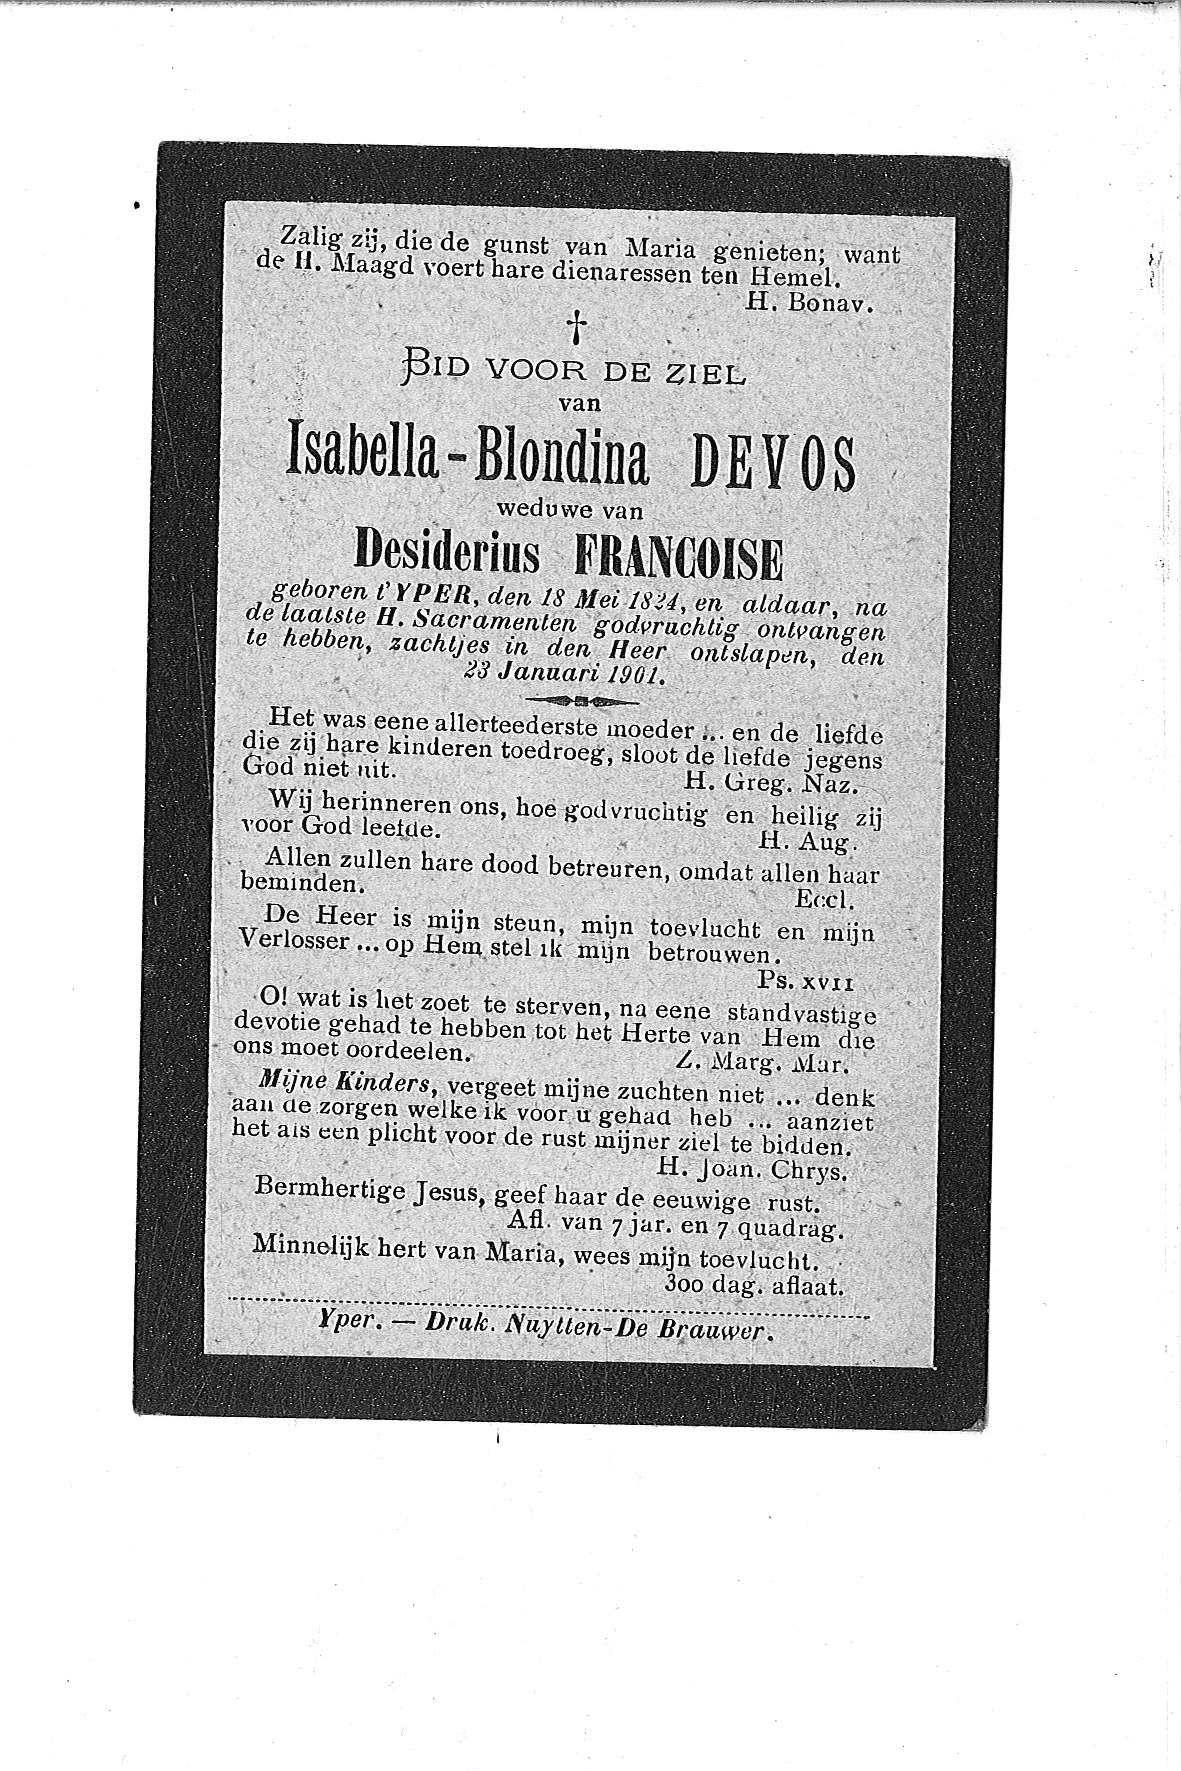 Isabella-Blondina (1901) 20120305132207_00099.jpg